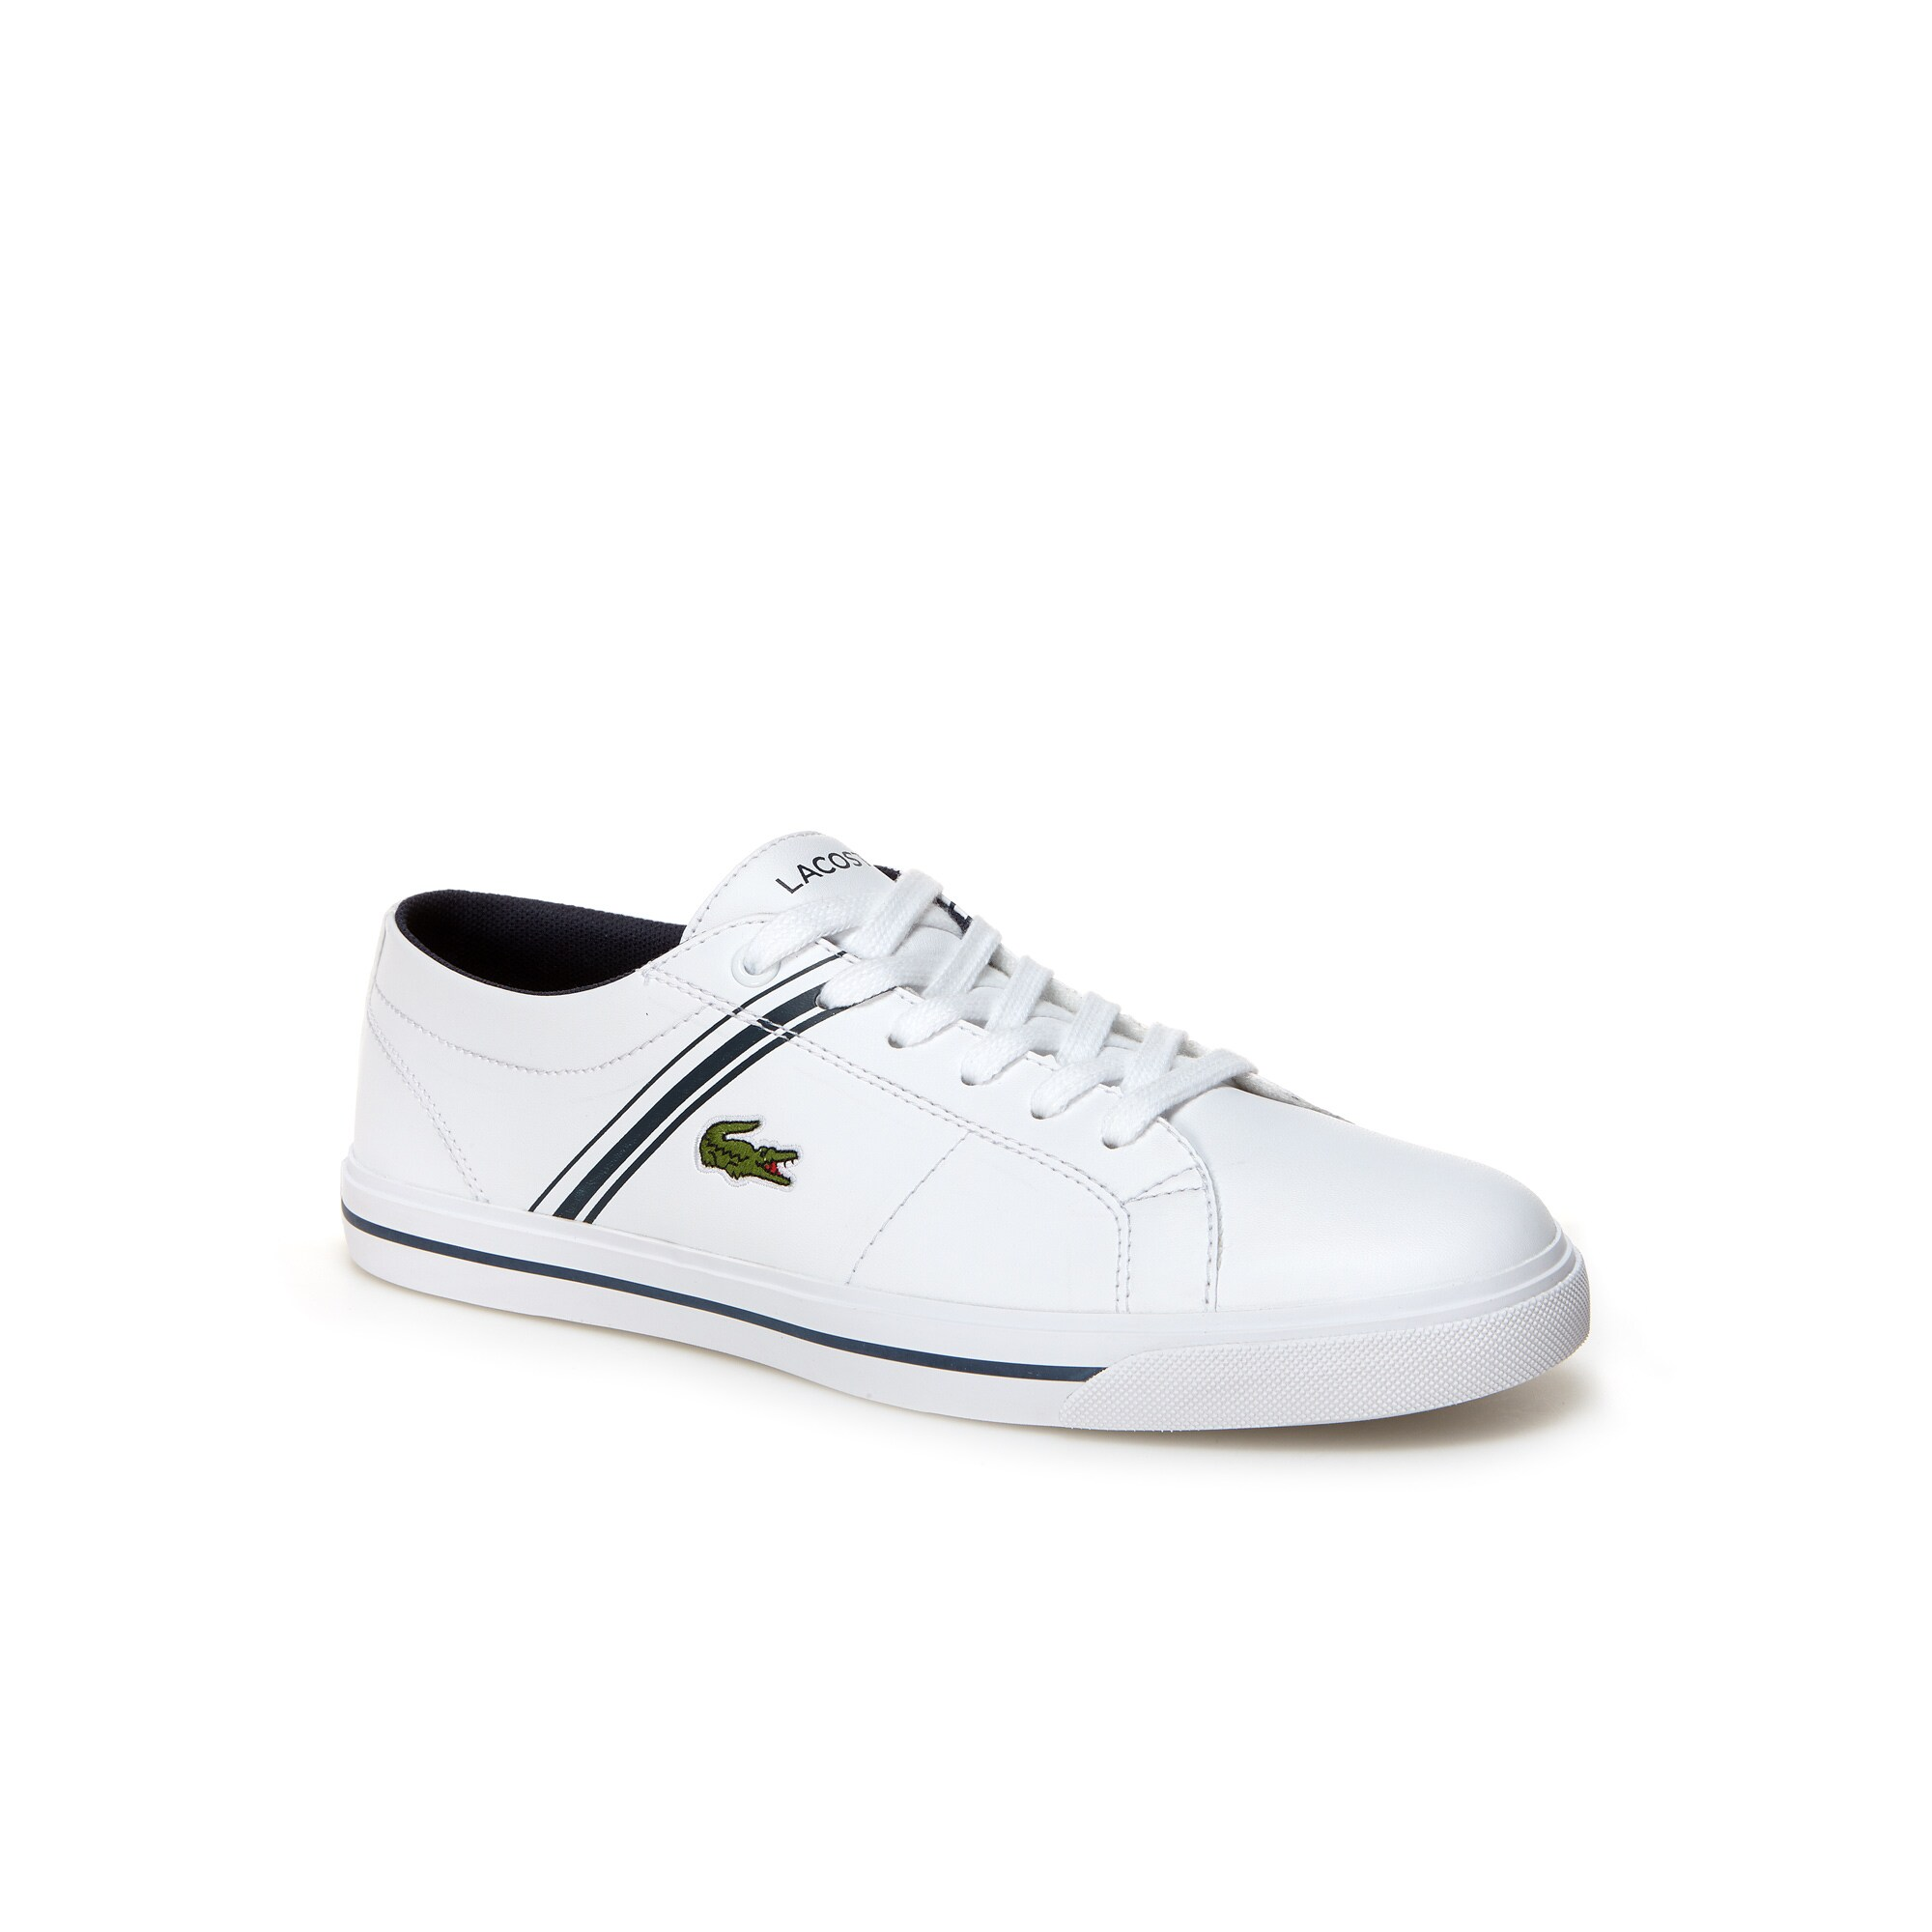 Teen-Sneakers RIBERAC in Leder-Optik